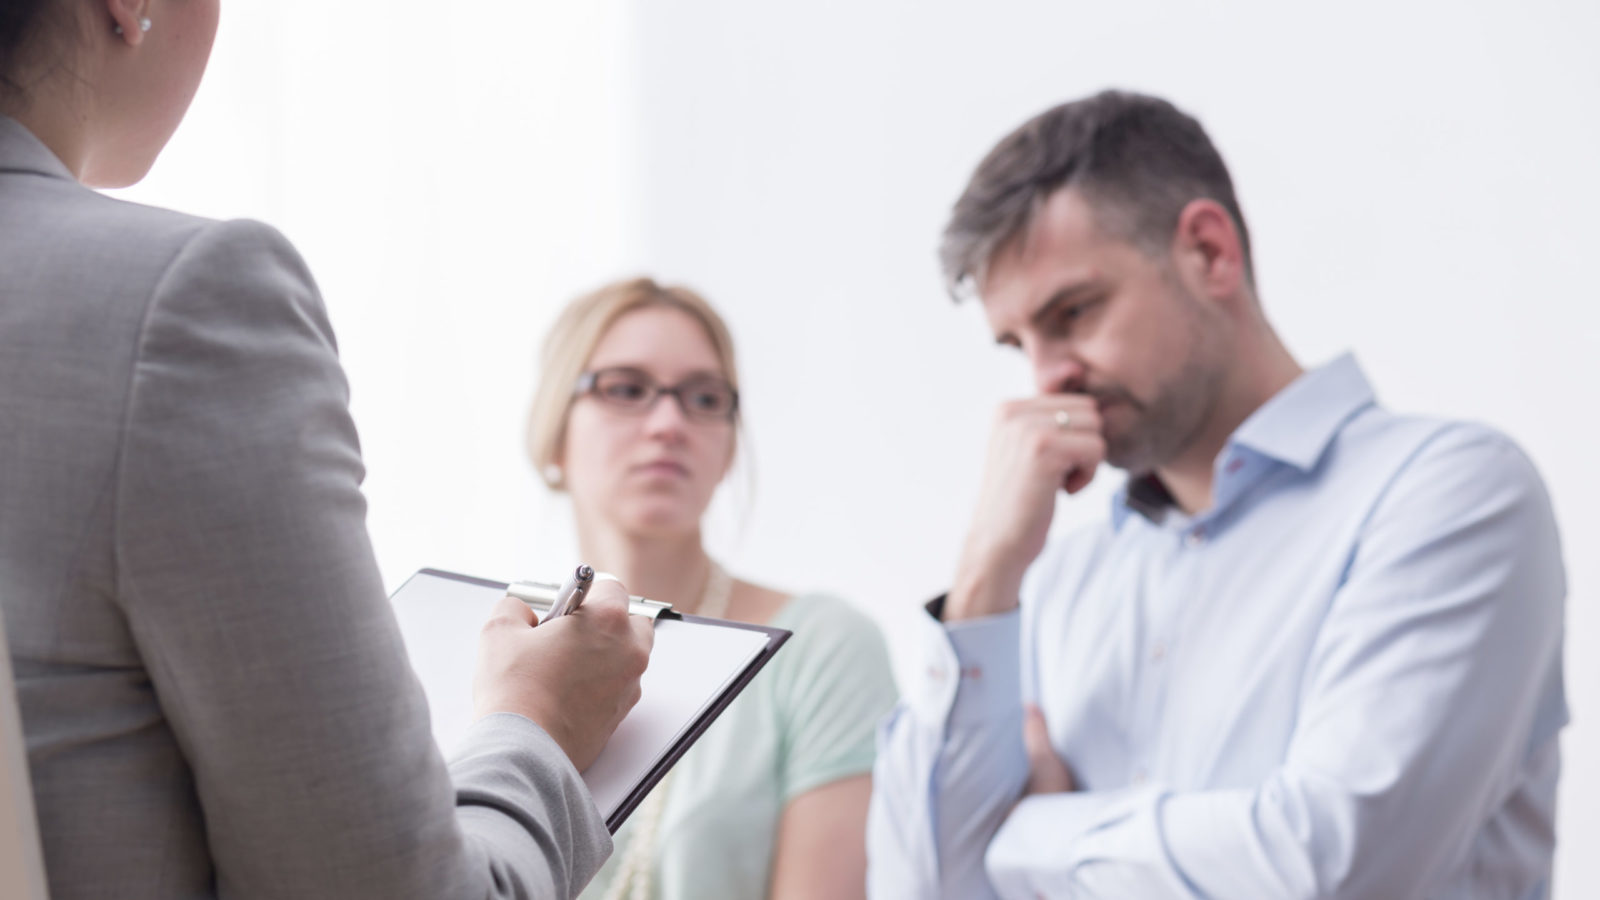 Shot of a mediator taking notes during the divorce mediation